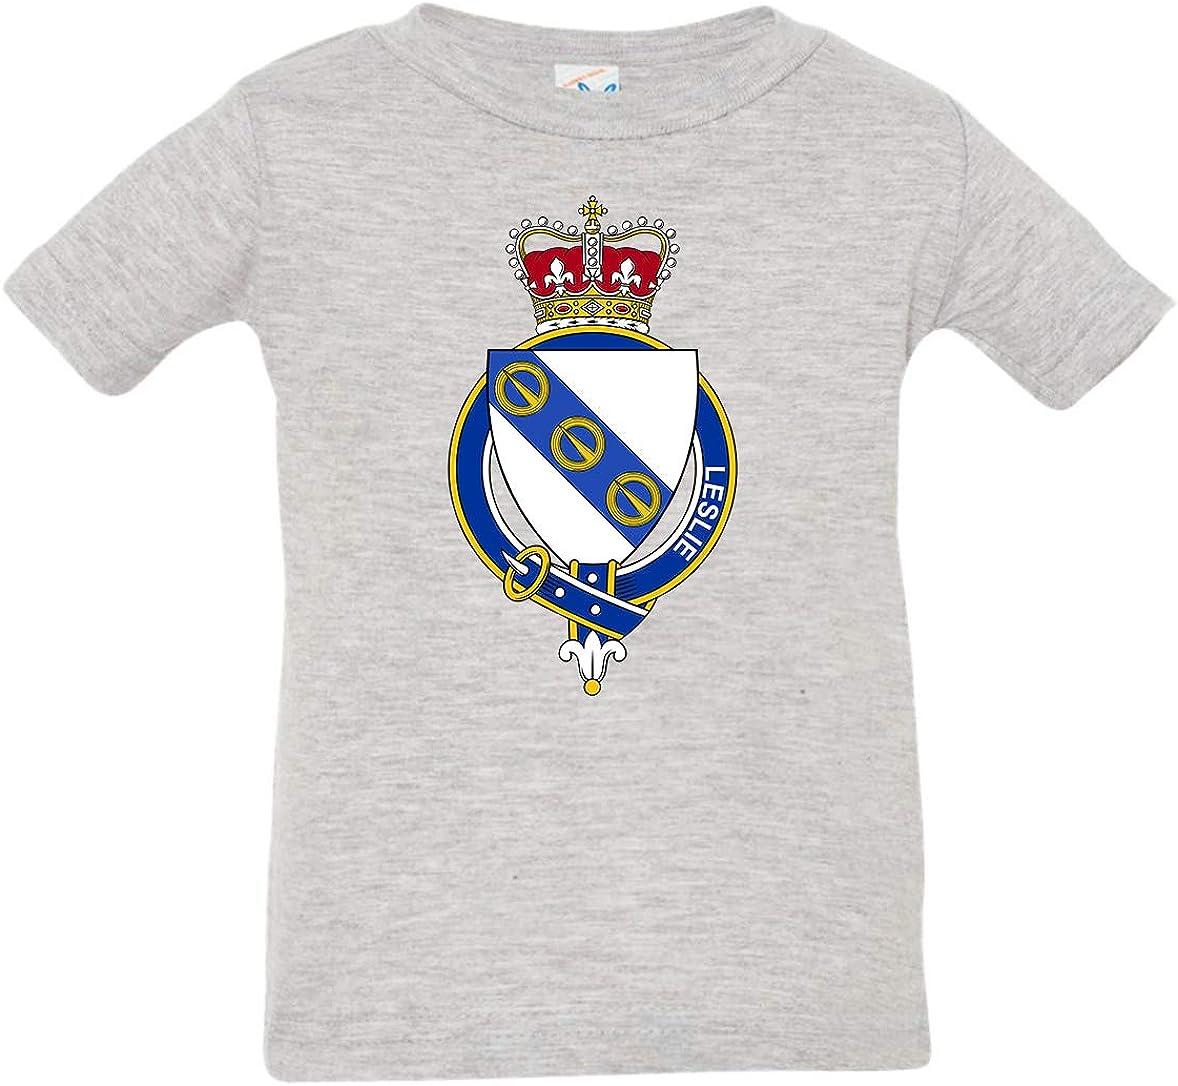 Tenacitee Babys Scottish Garter Family Leslie Shirt